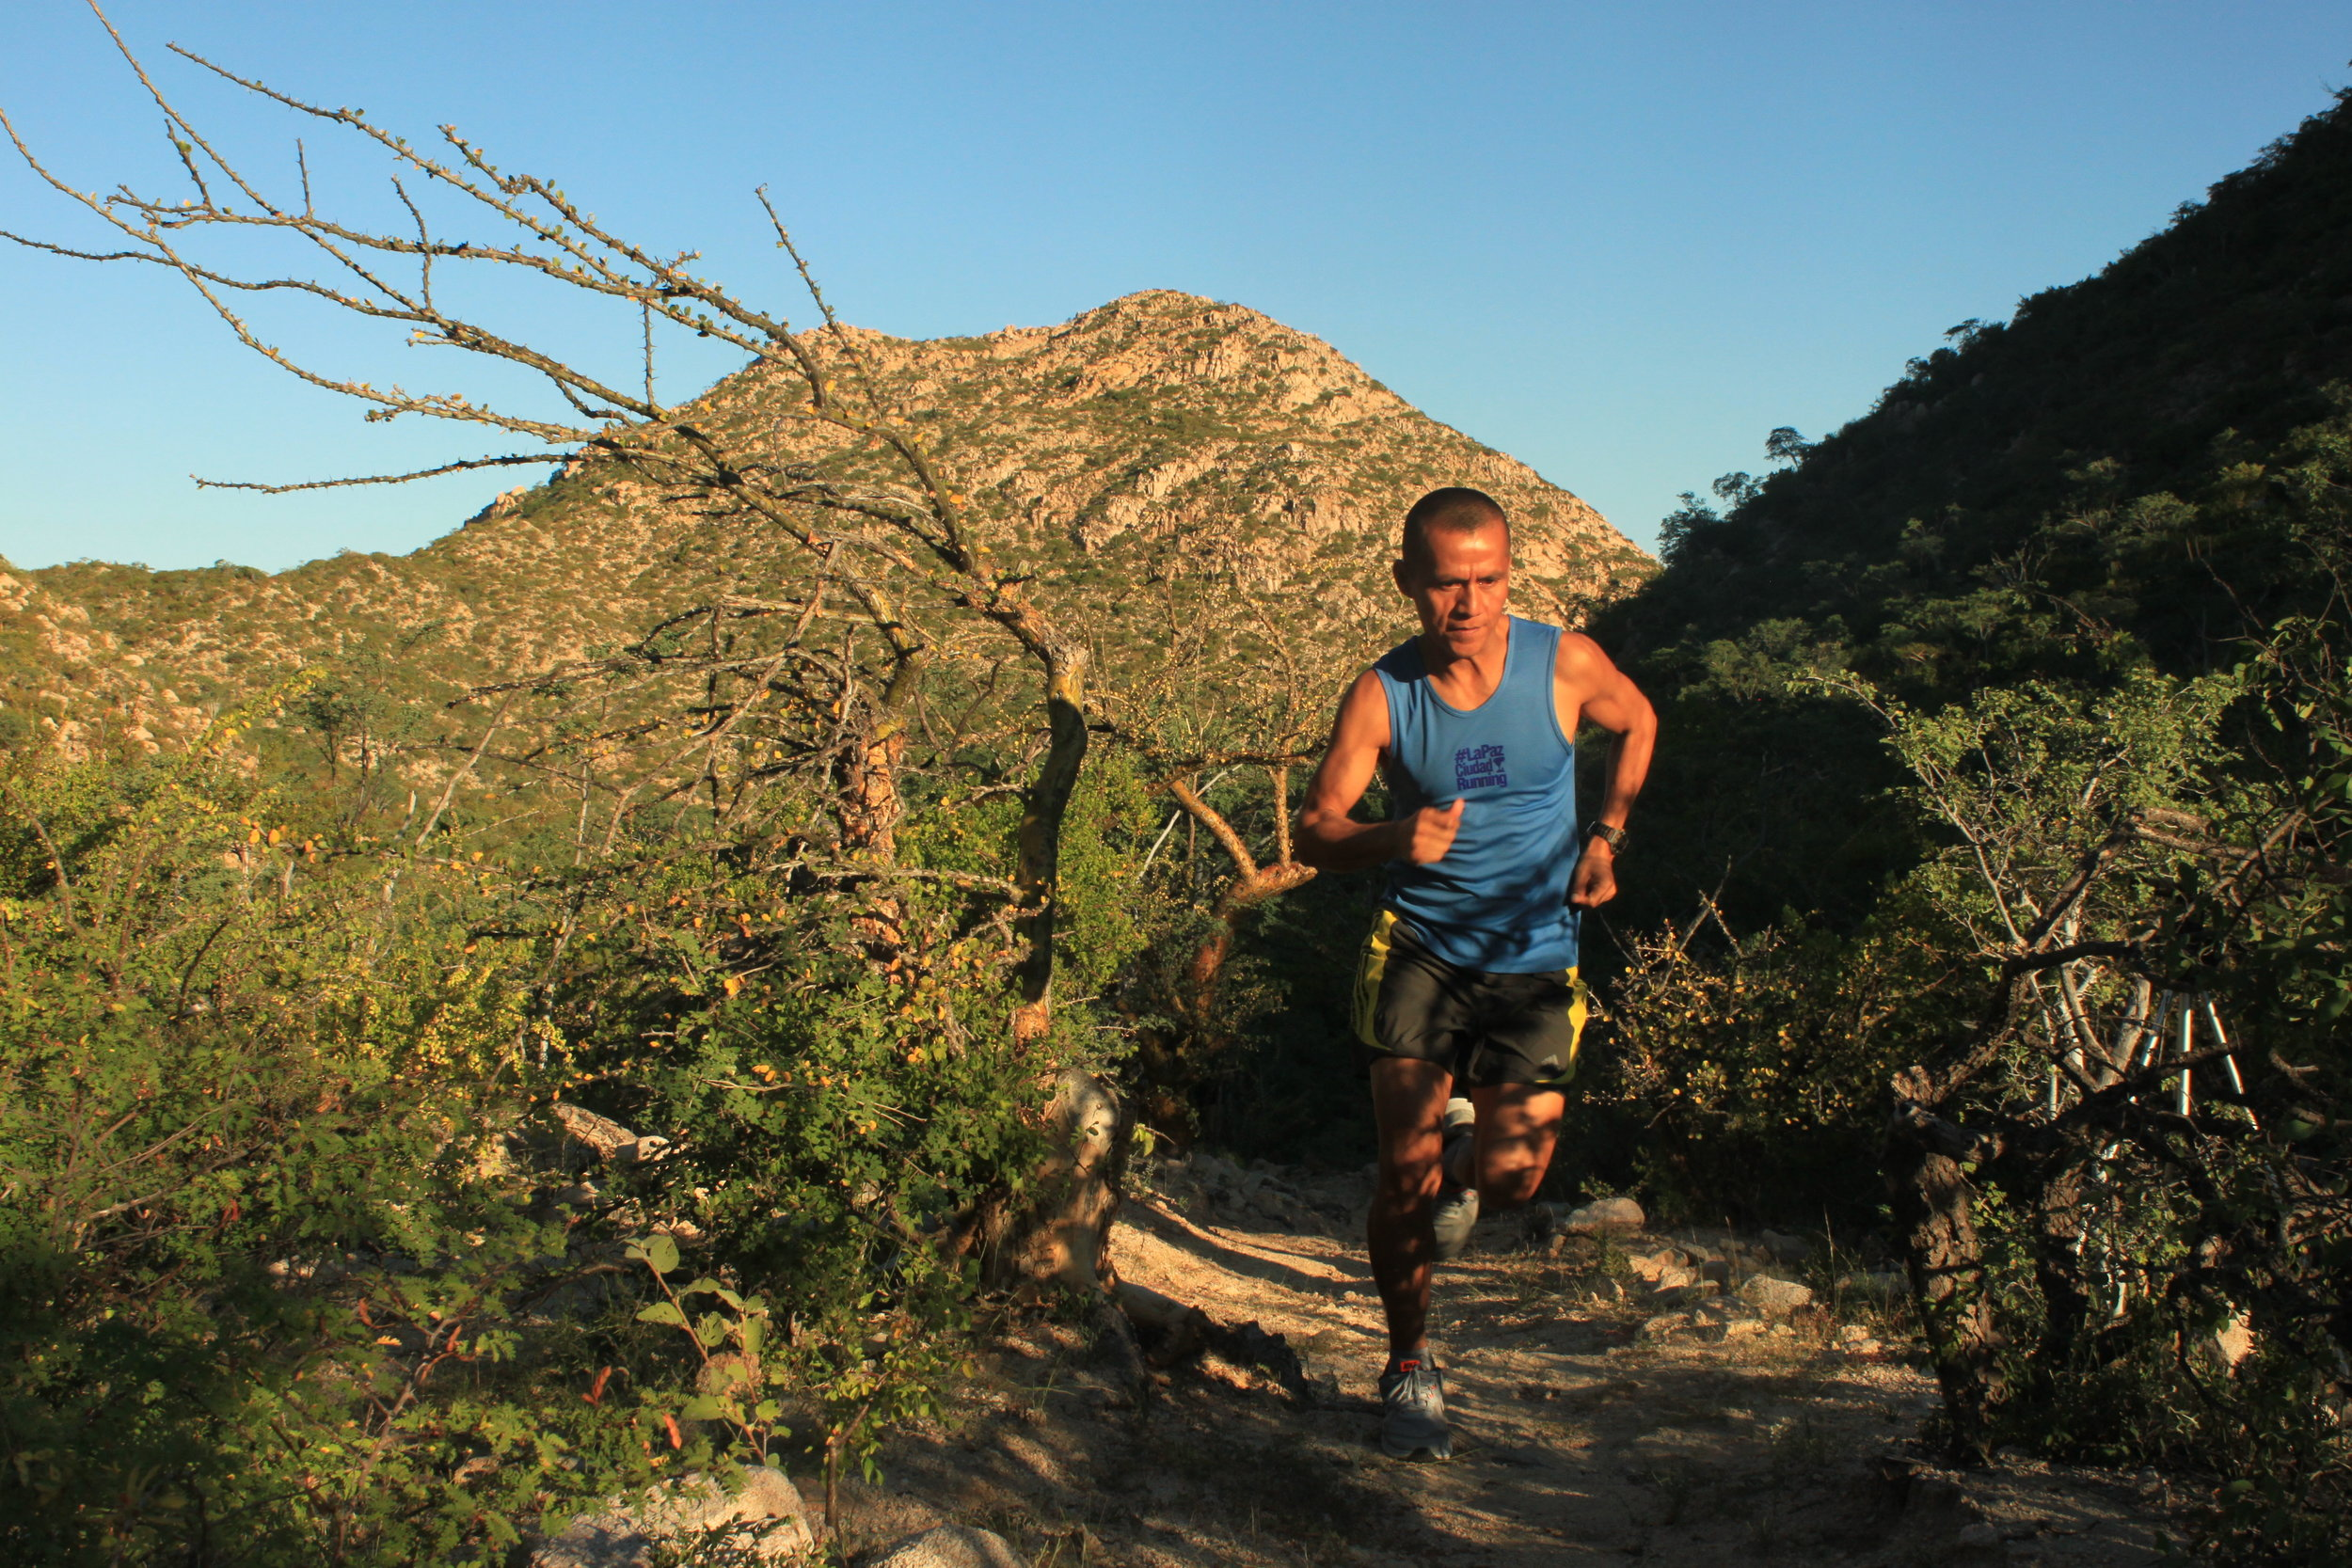 carrera-don-diablo-trail-run-la-paz-baja-california-sur (1).jpg